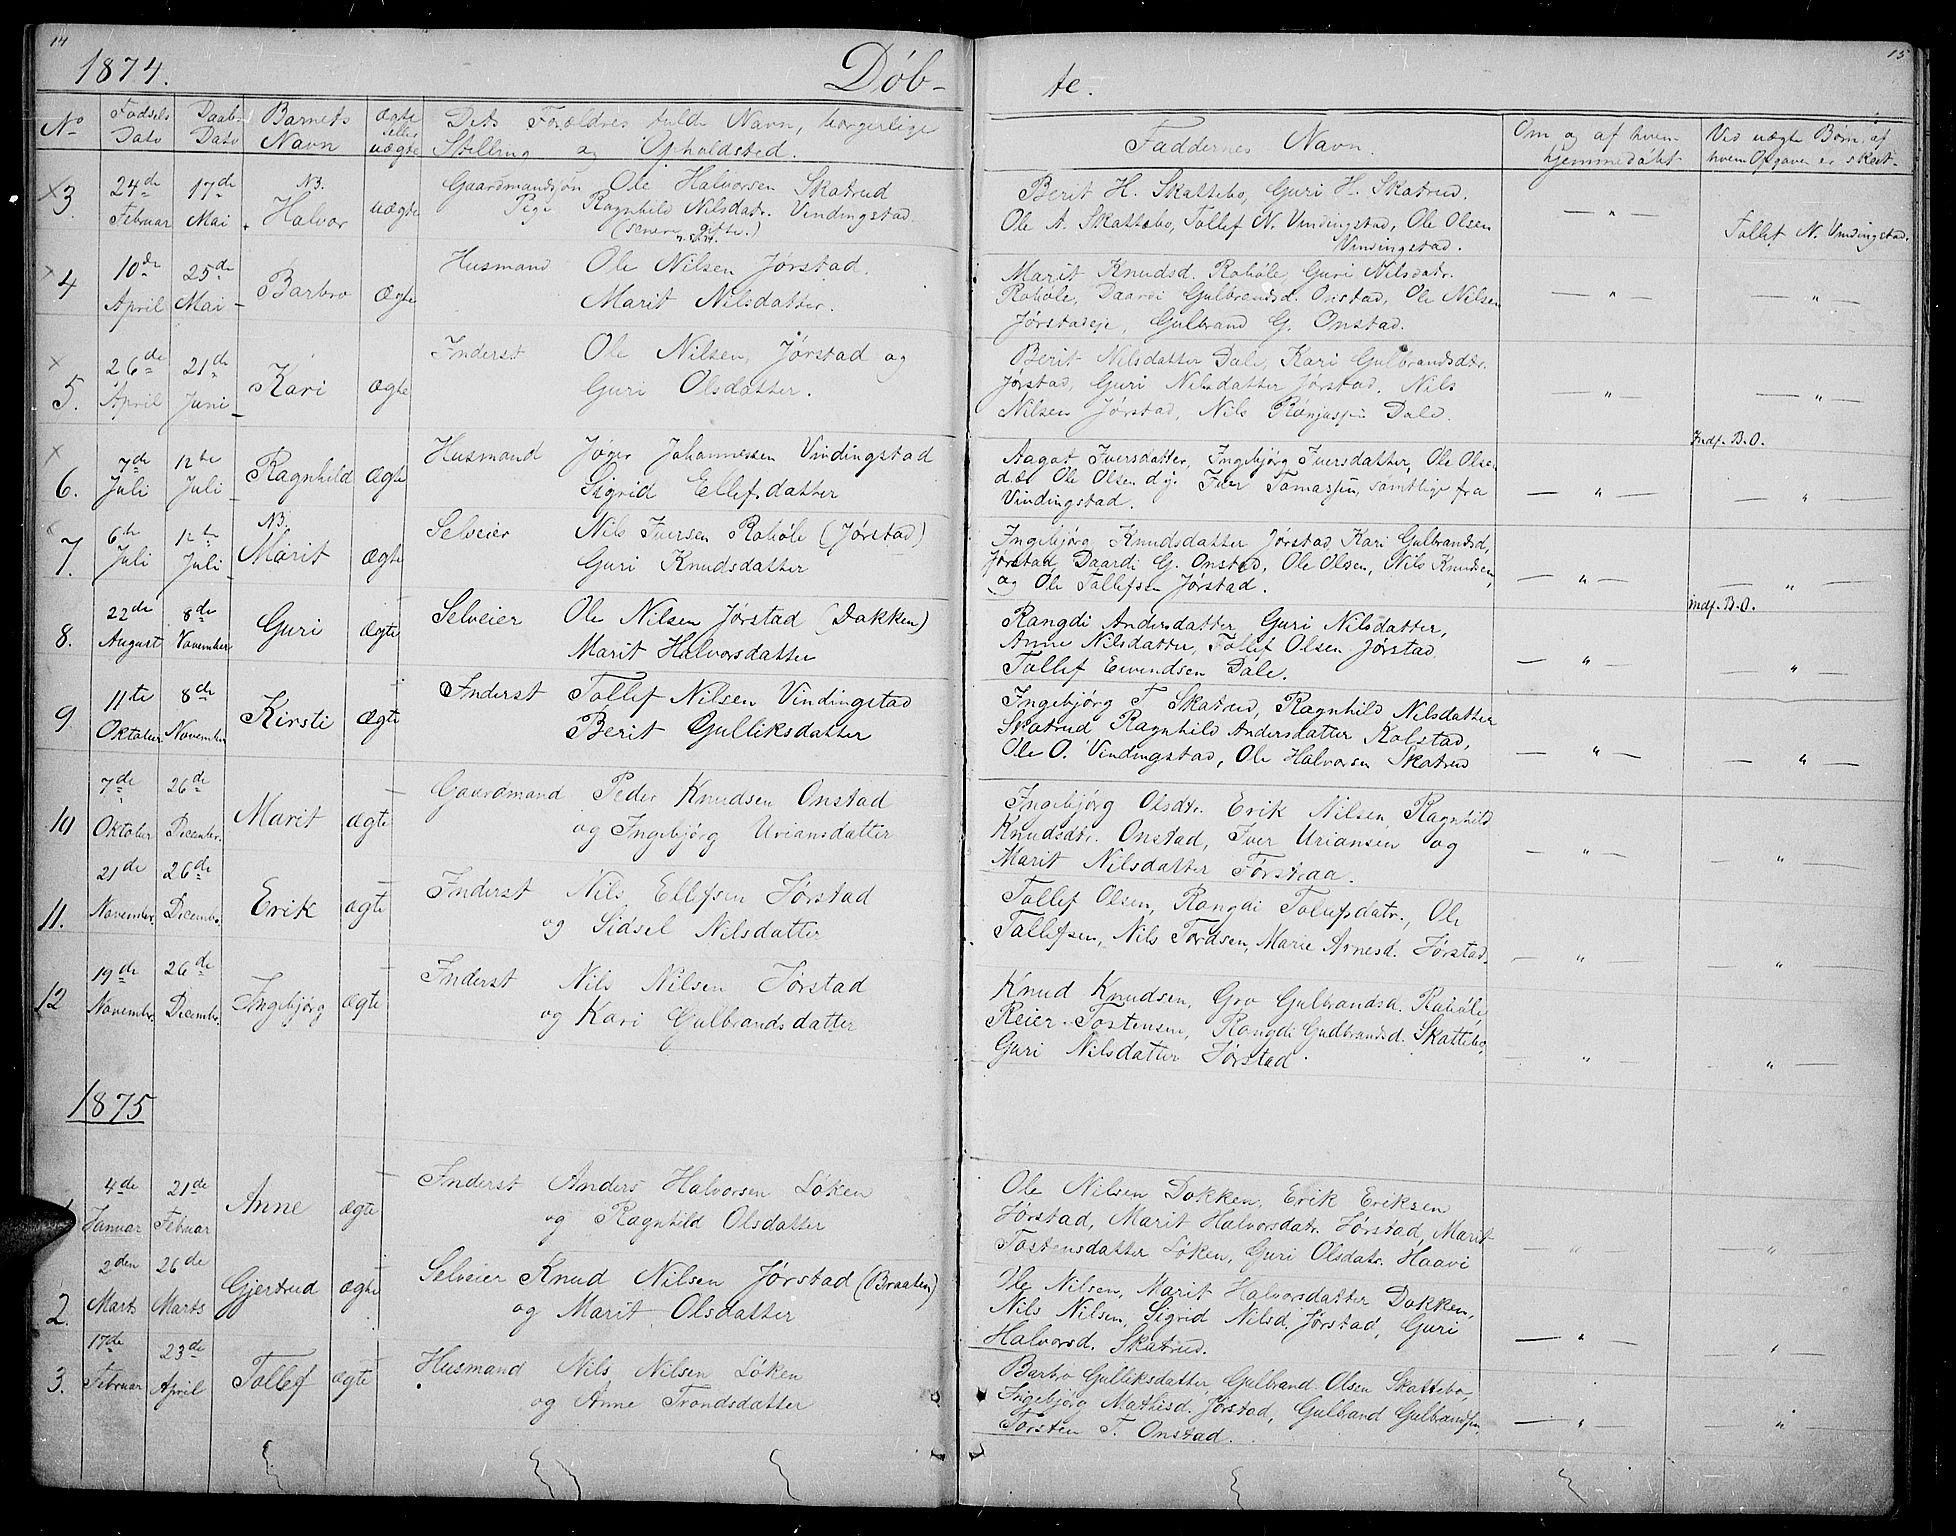 SAH, Øystre Slidre prestekontor, Klokkerbok nr. 2, 1866-1886, s. 14-15